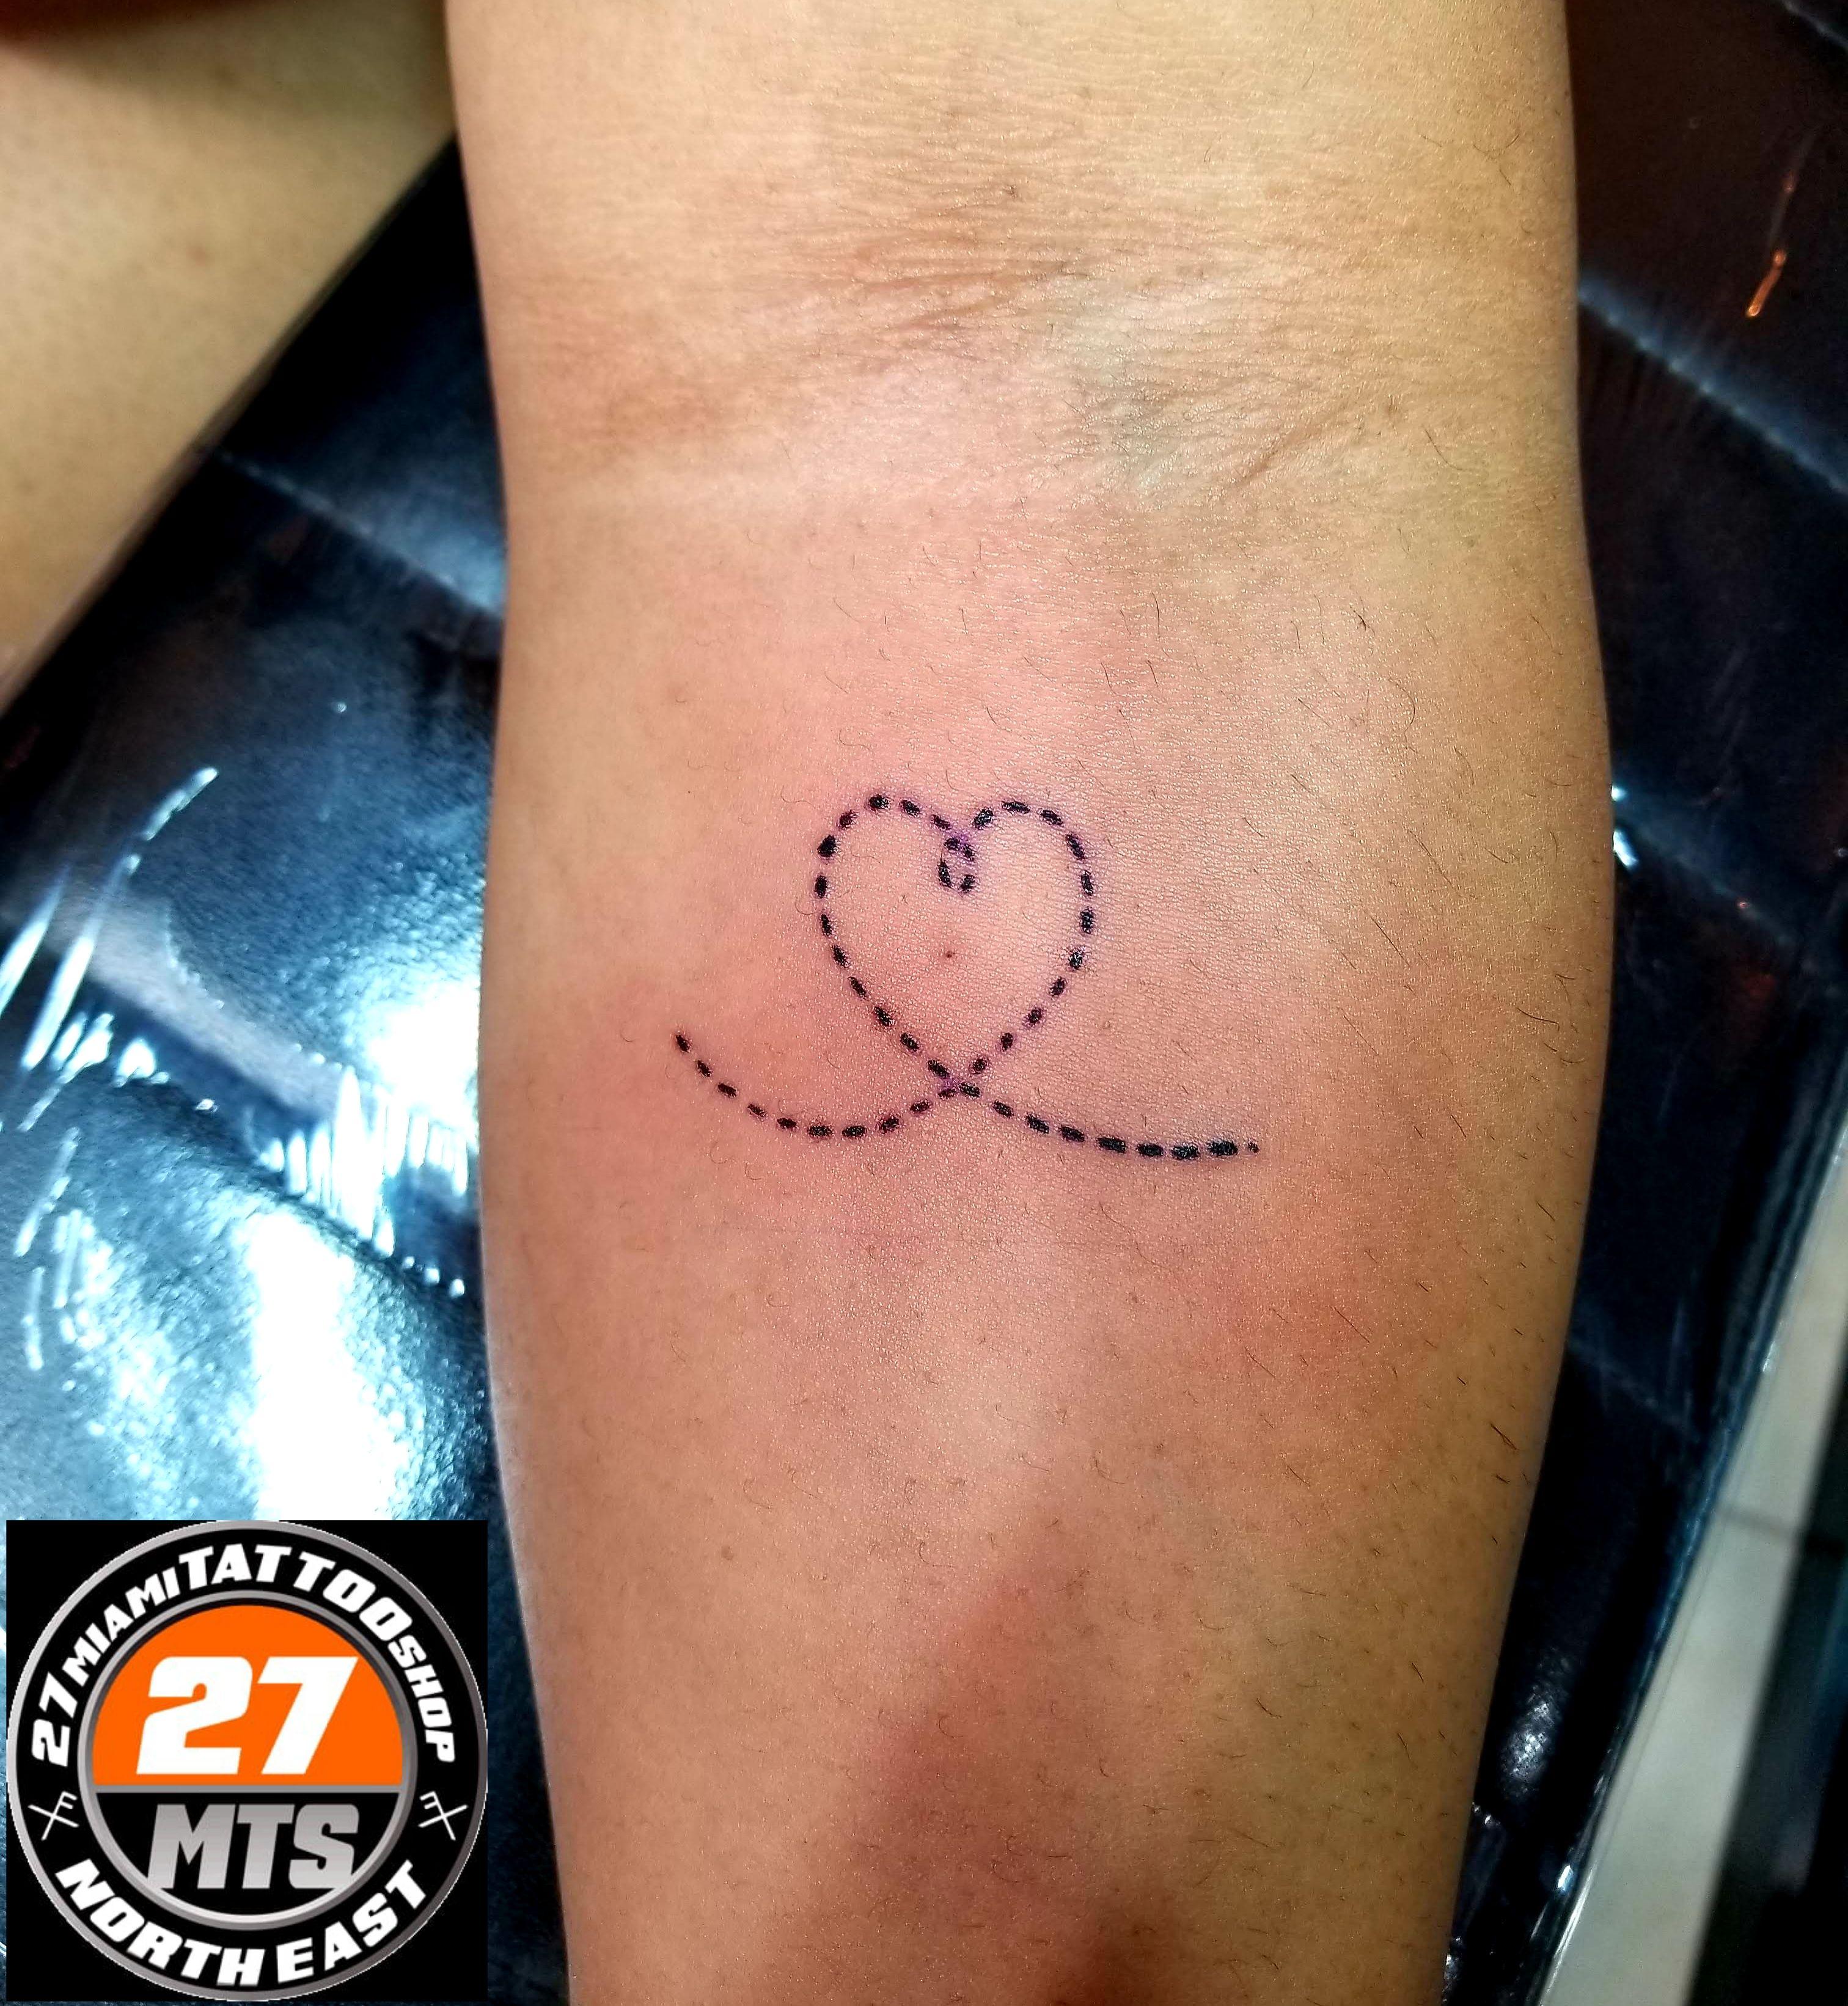 Pin by 27 miami tatoo shop north eas on tattoo near me